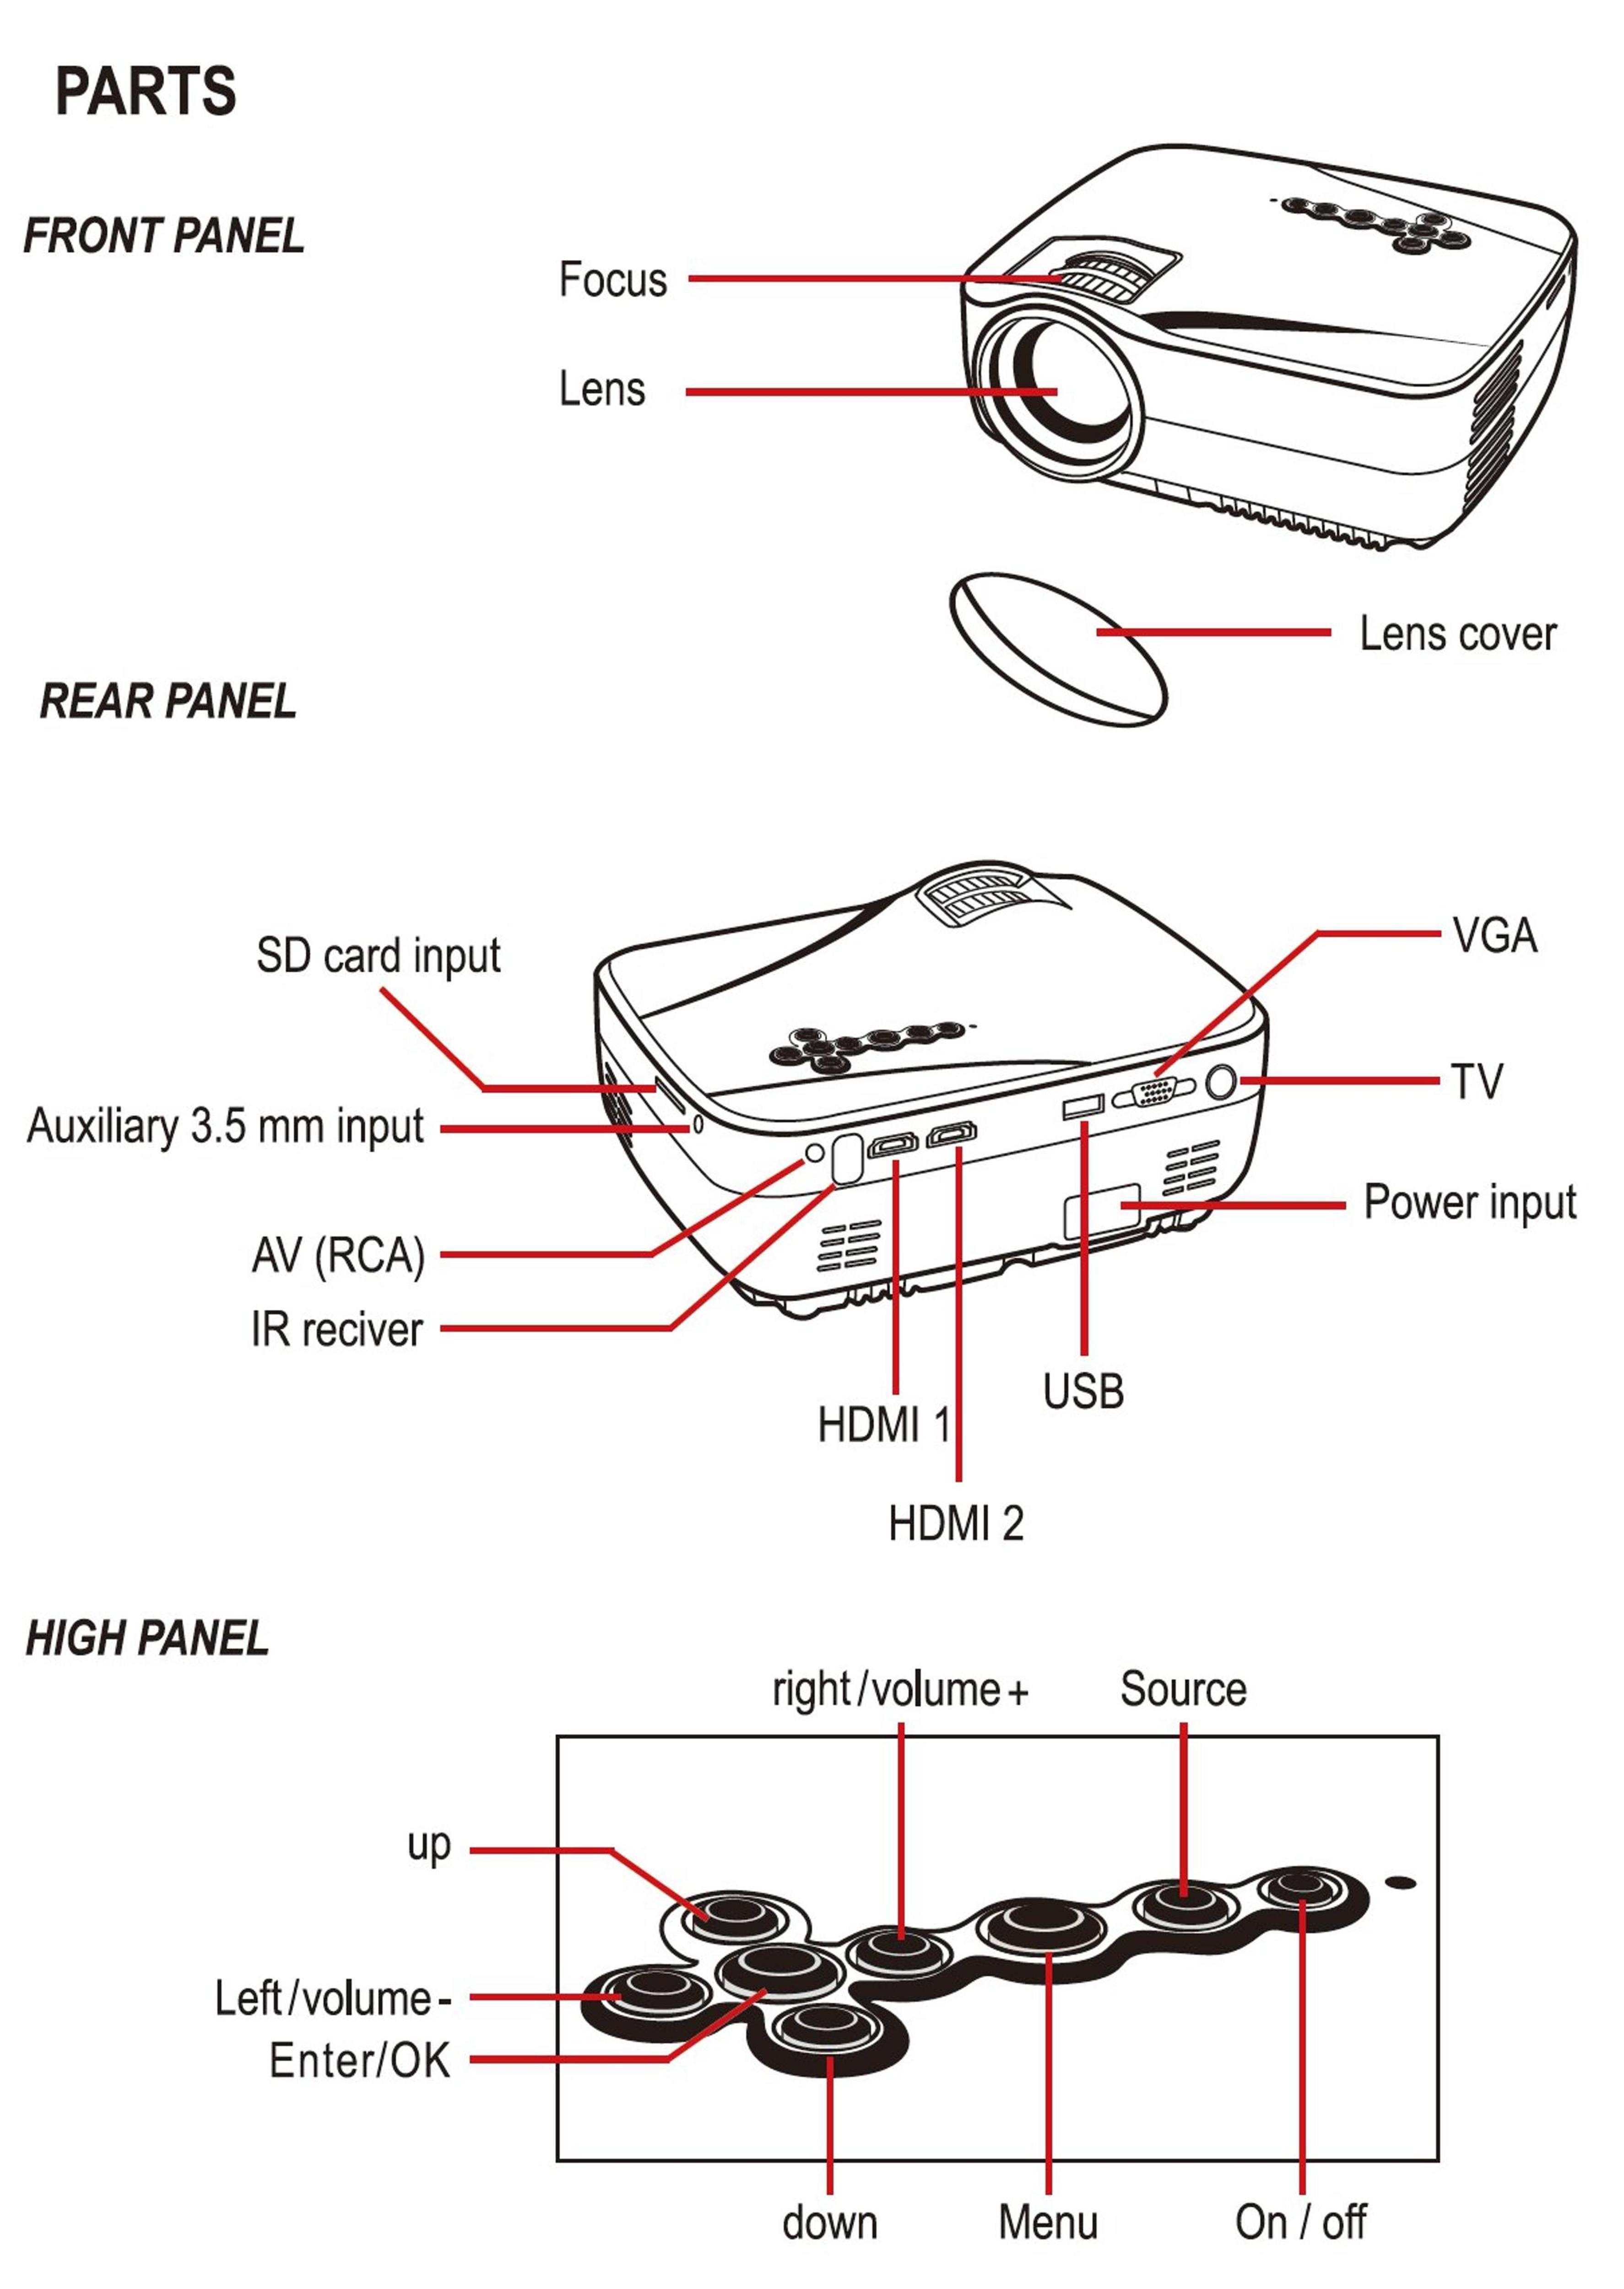 Rca 19 Inch Lcd Tv Manual